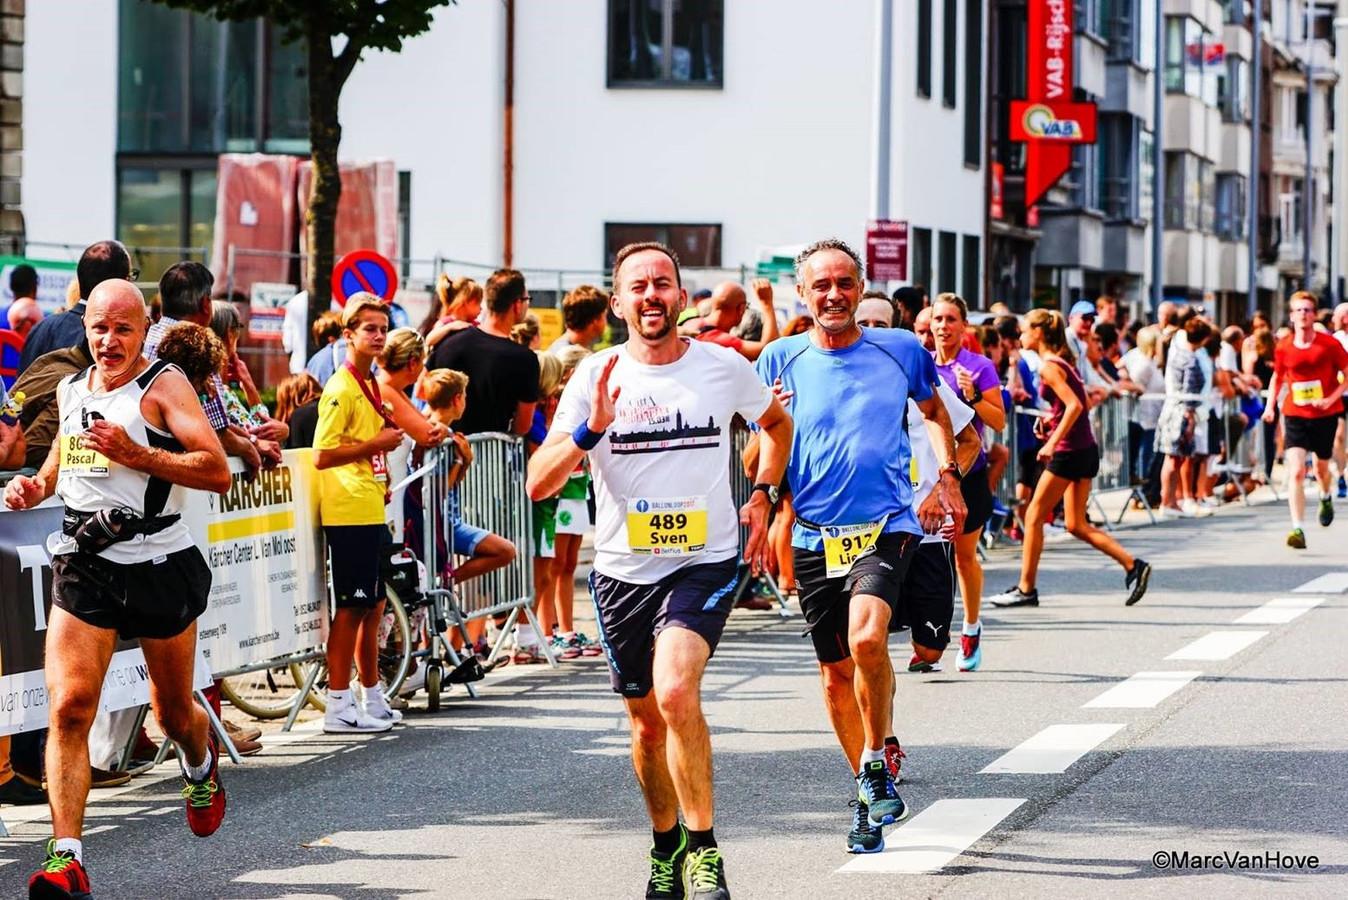 Lieven Wauters (blauwe shirt) loopt zaterdag 8 augustus 2020 solo de Kustmarathon.